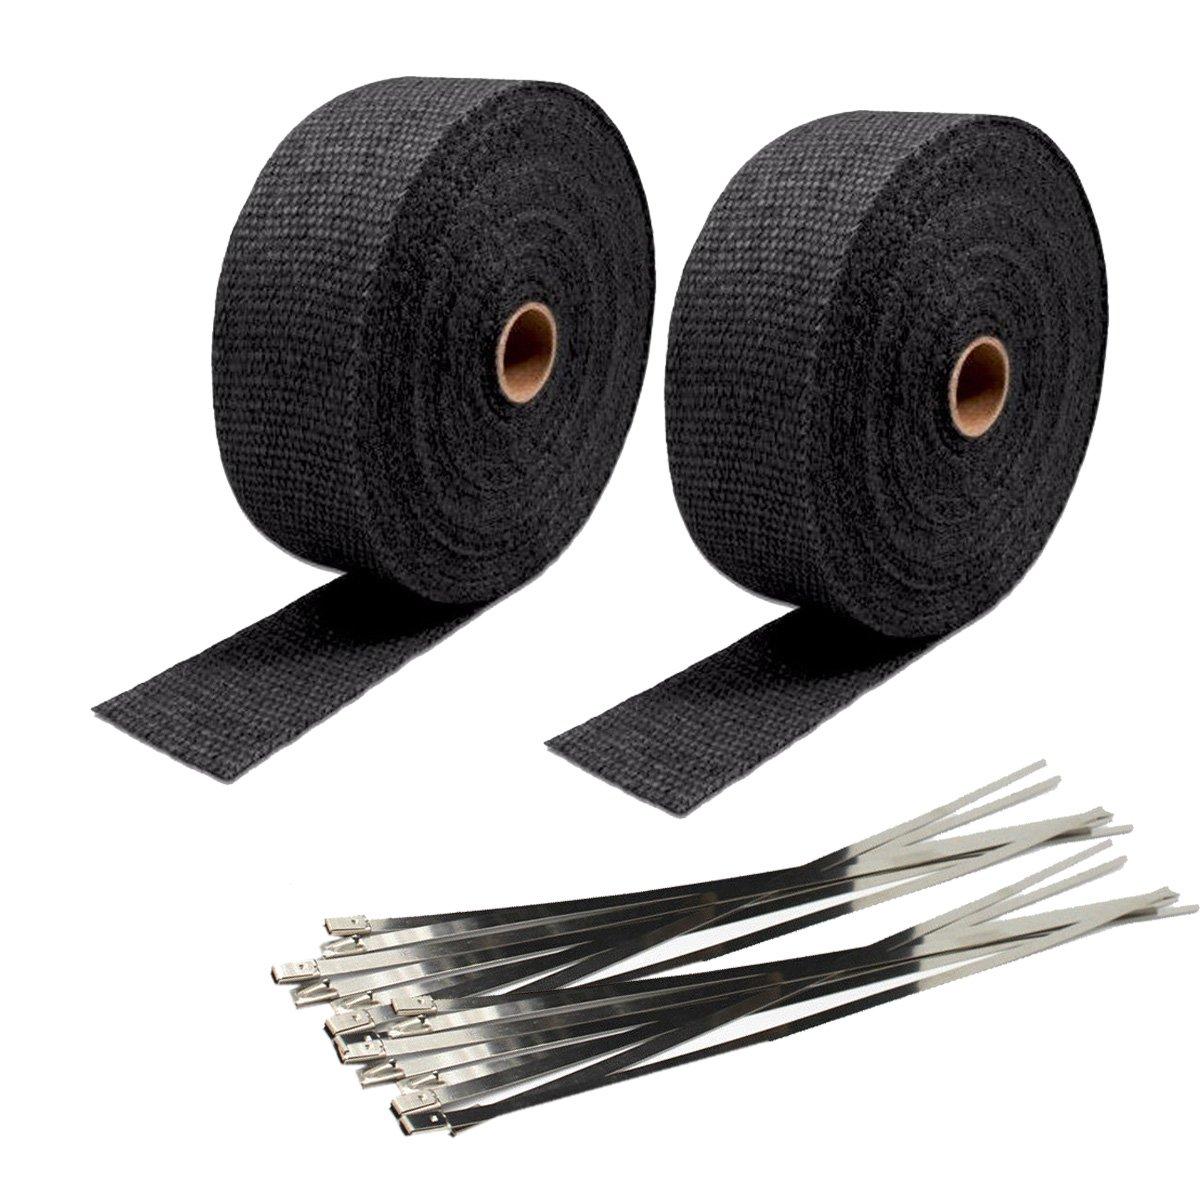 2 Roll 2''x50' Black Fiberglass Exhaust Heat Wrap Heat Shield Sleeve with Stainless Steel Zip Ties (Pack of 20)